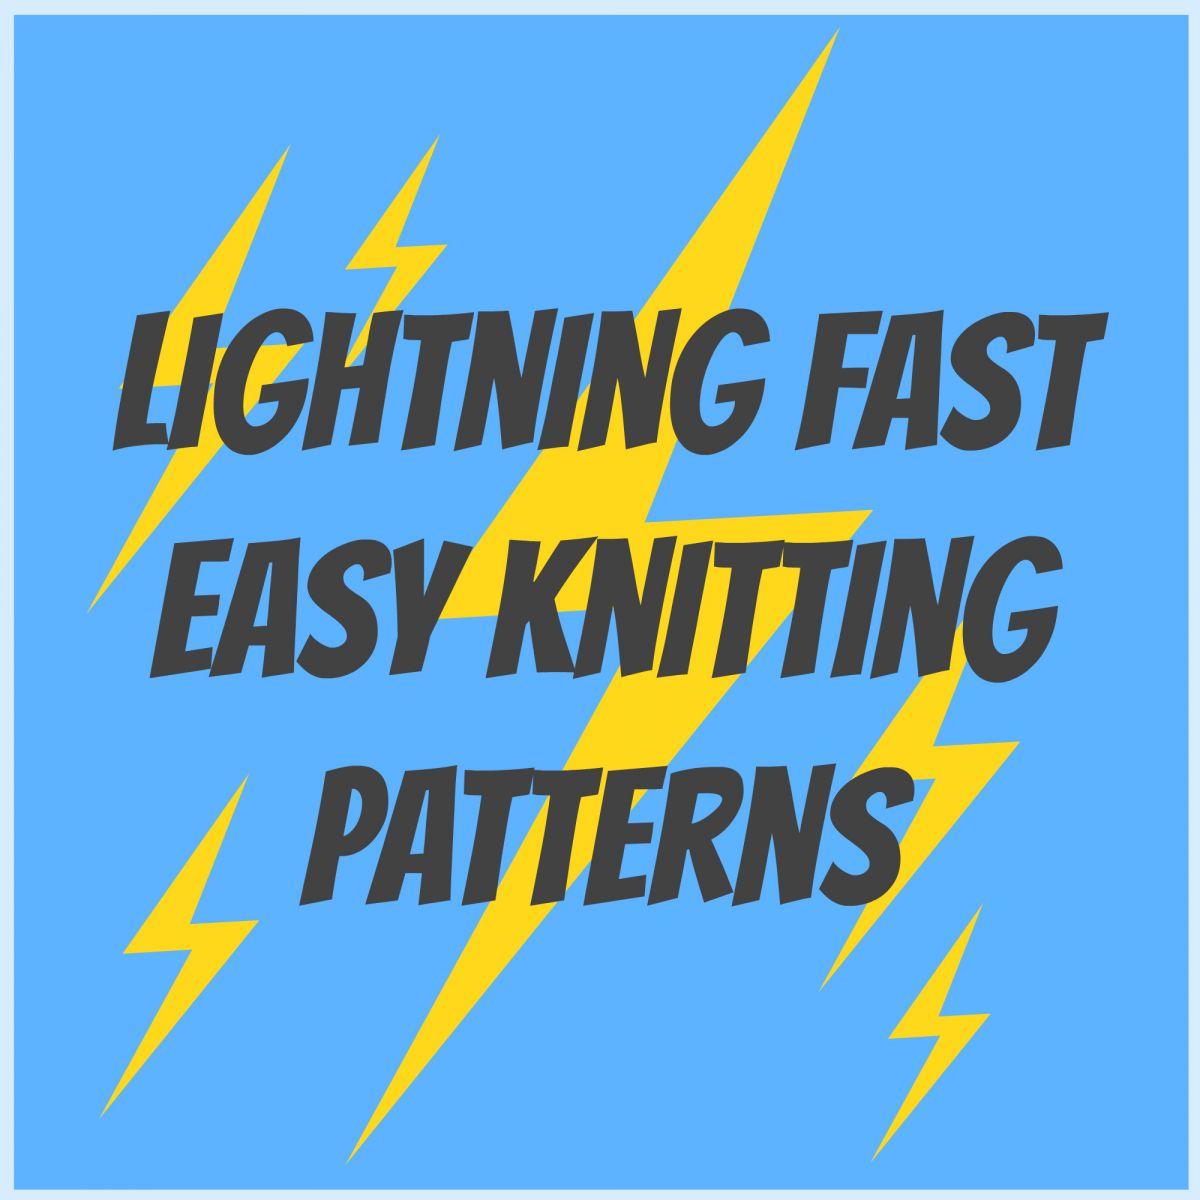 8 Lightning Fast Easy Knitting Patterns | AllFreeKnitting.com